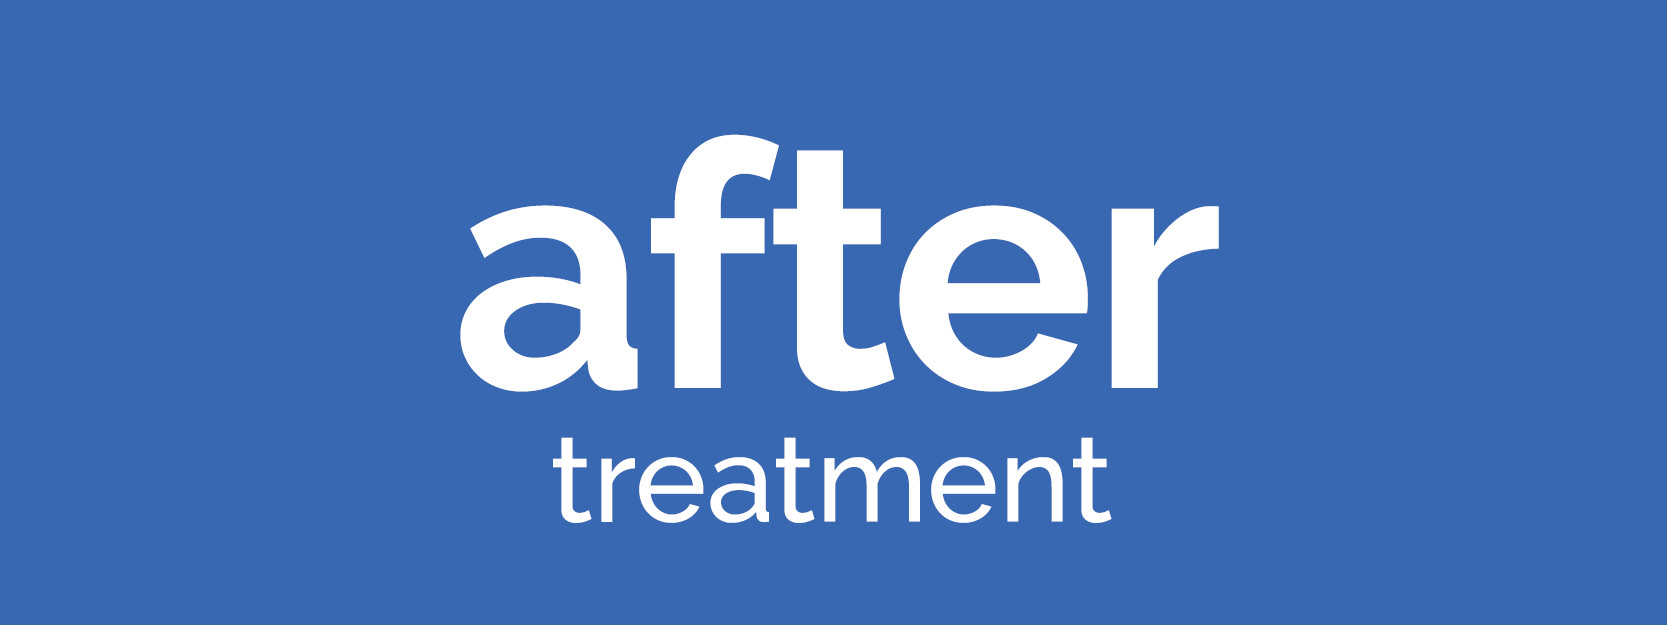 after treatment.pdf